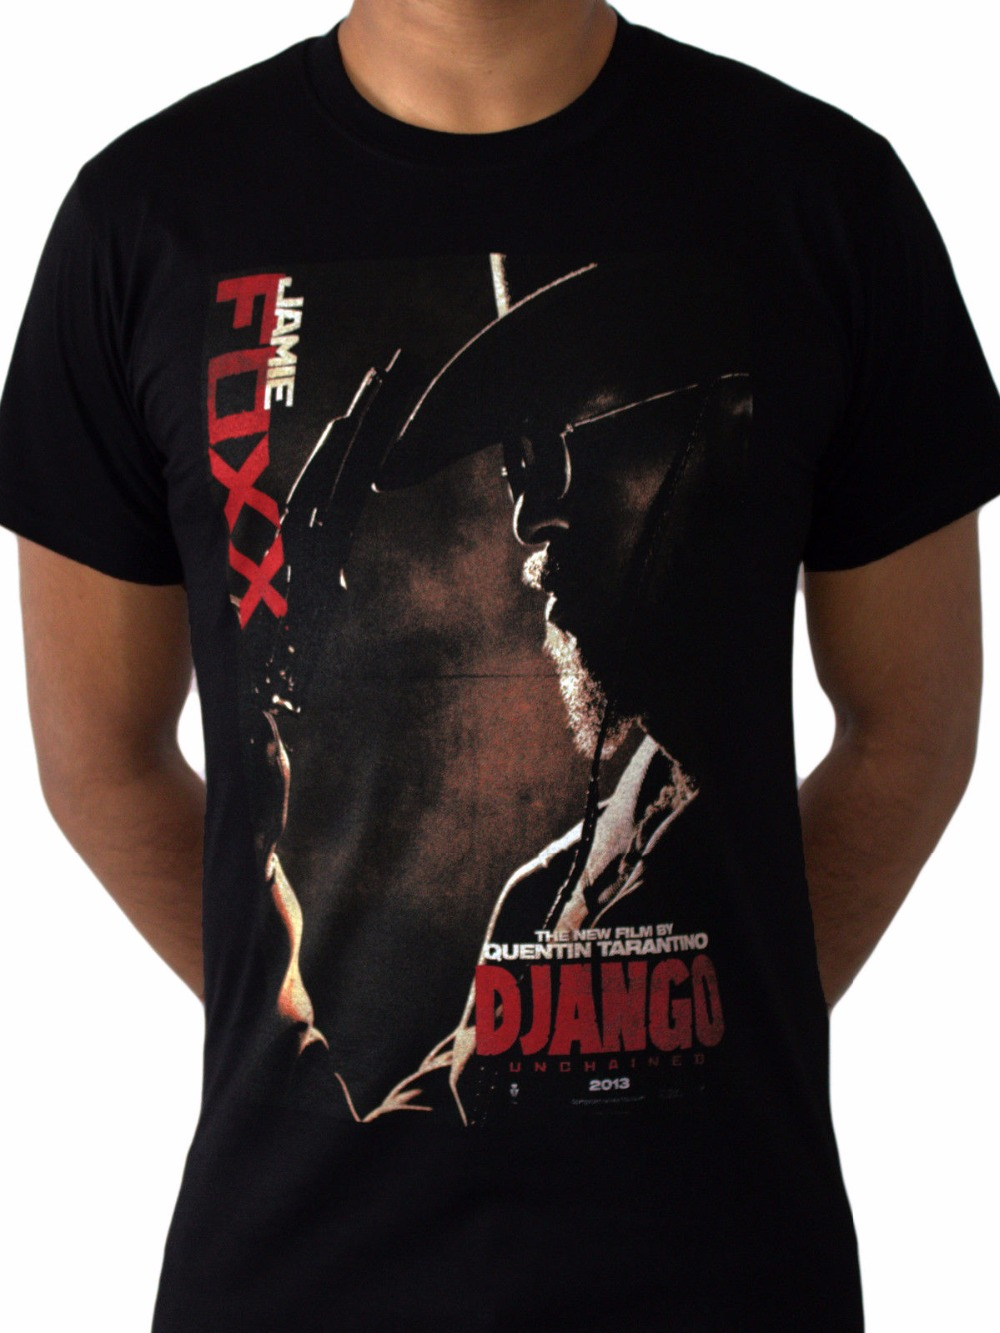 comfortable-office-django-unchained-jamie-foxx-movie-poster-font-b-tarantino-b-font-western-black-mens-t-shirt-o-neck-short-sleeve-mens-tee